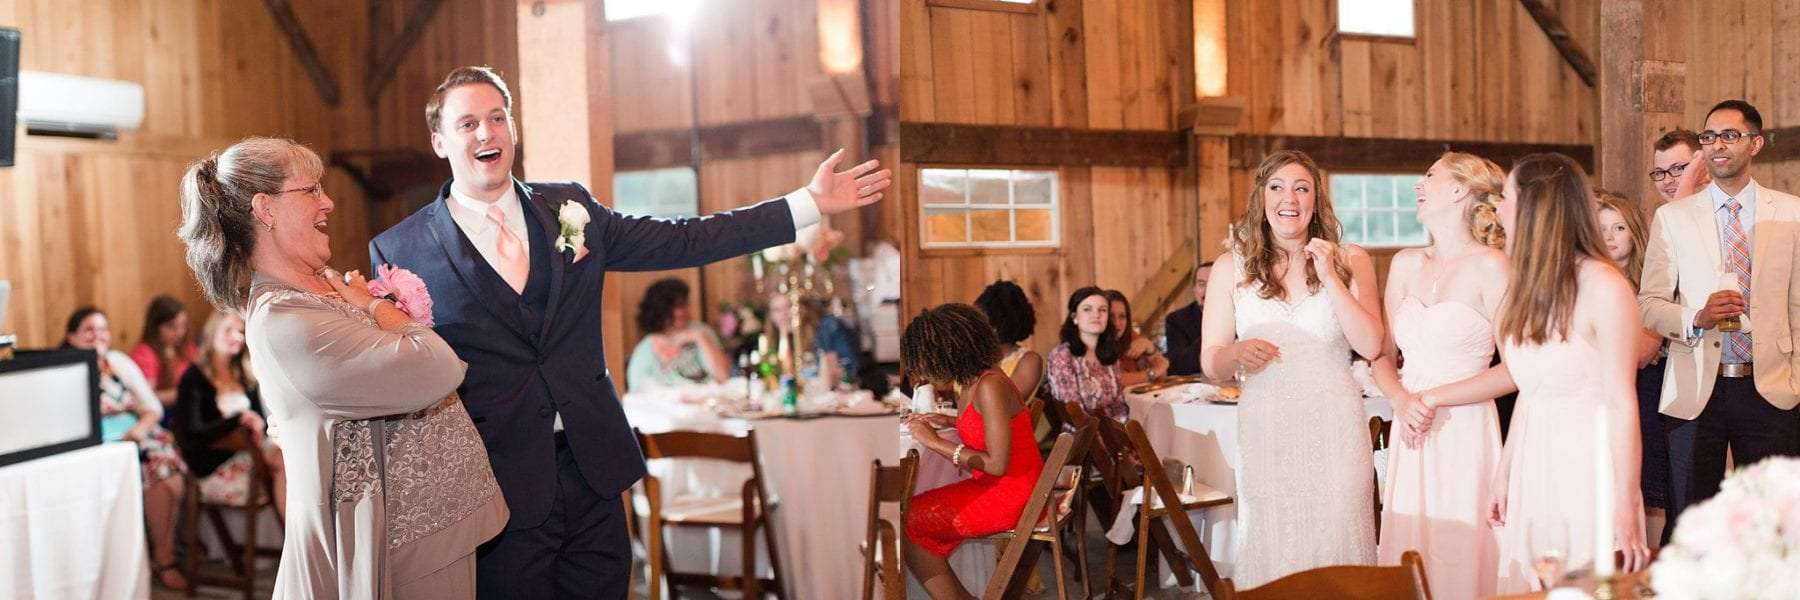 Justin & Megan Big Spring Farm Wedding Photos-489.jpg